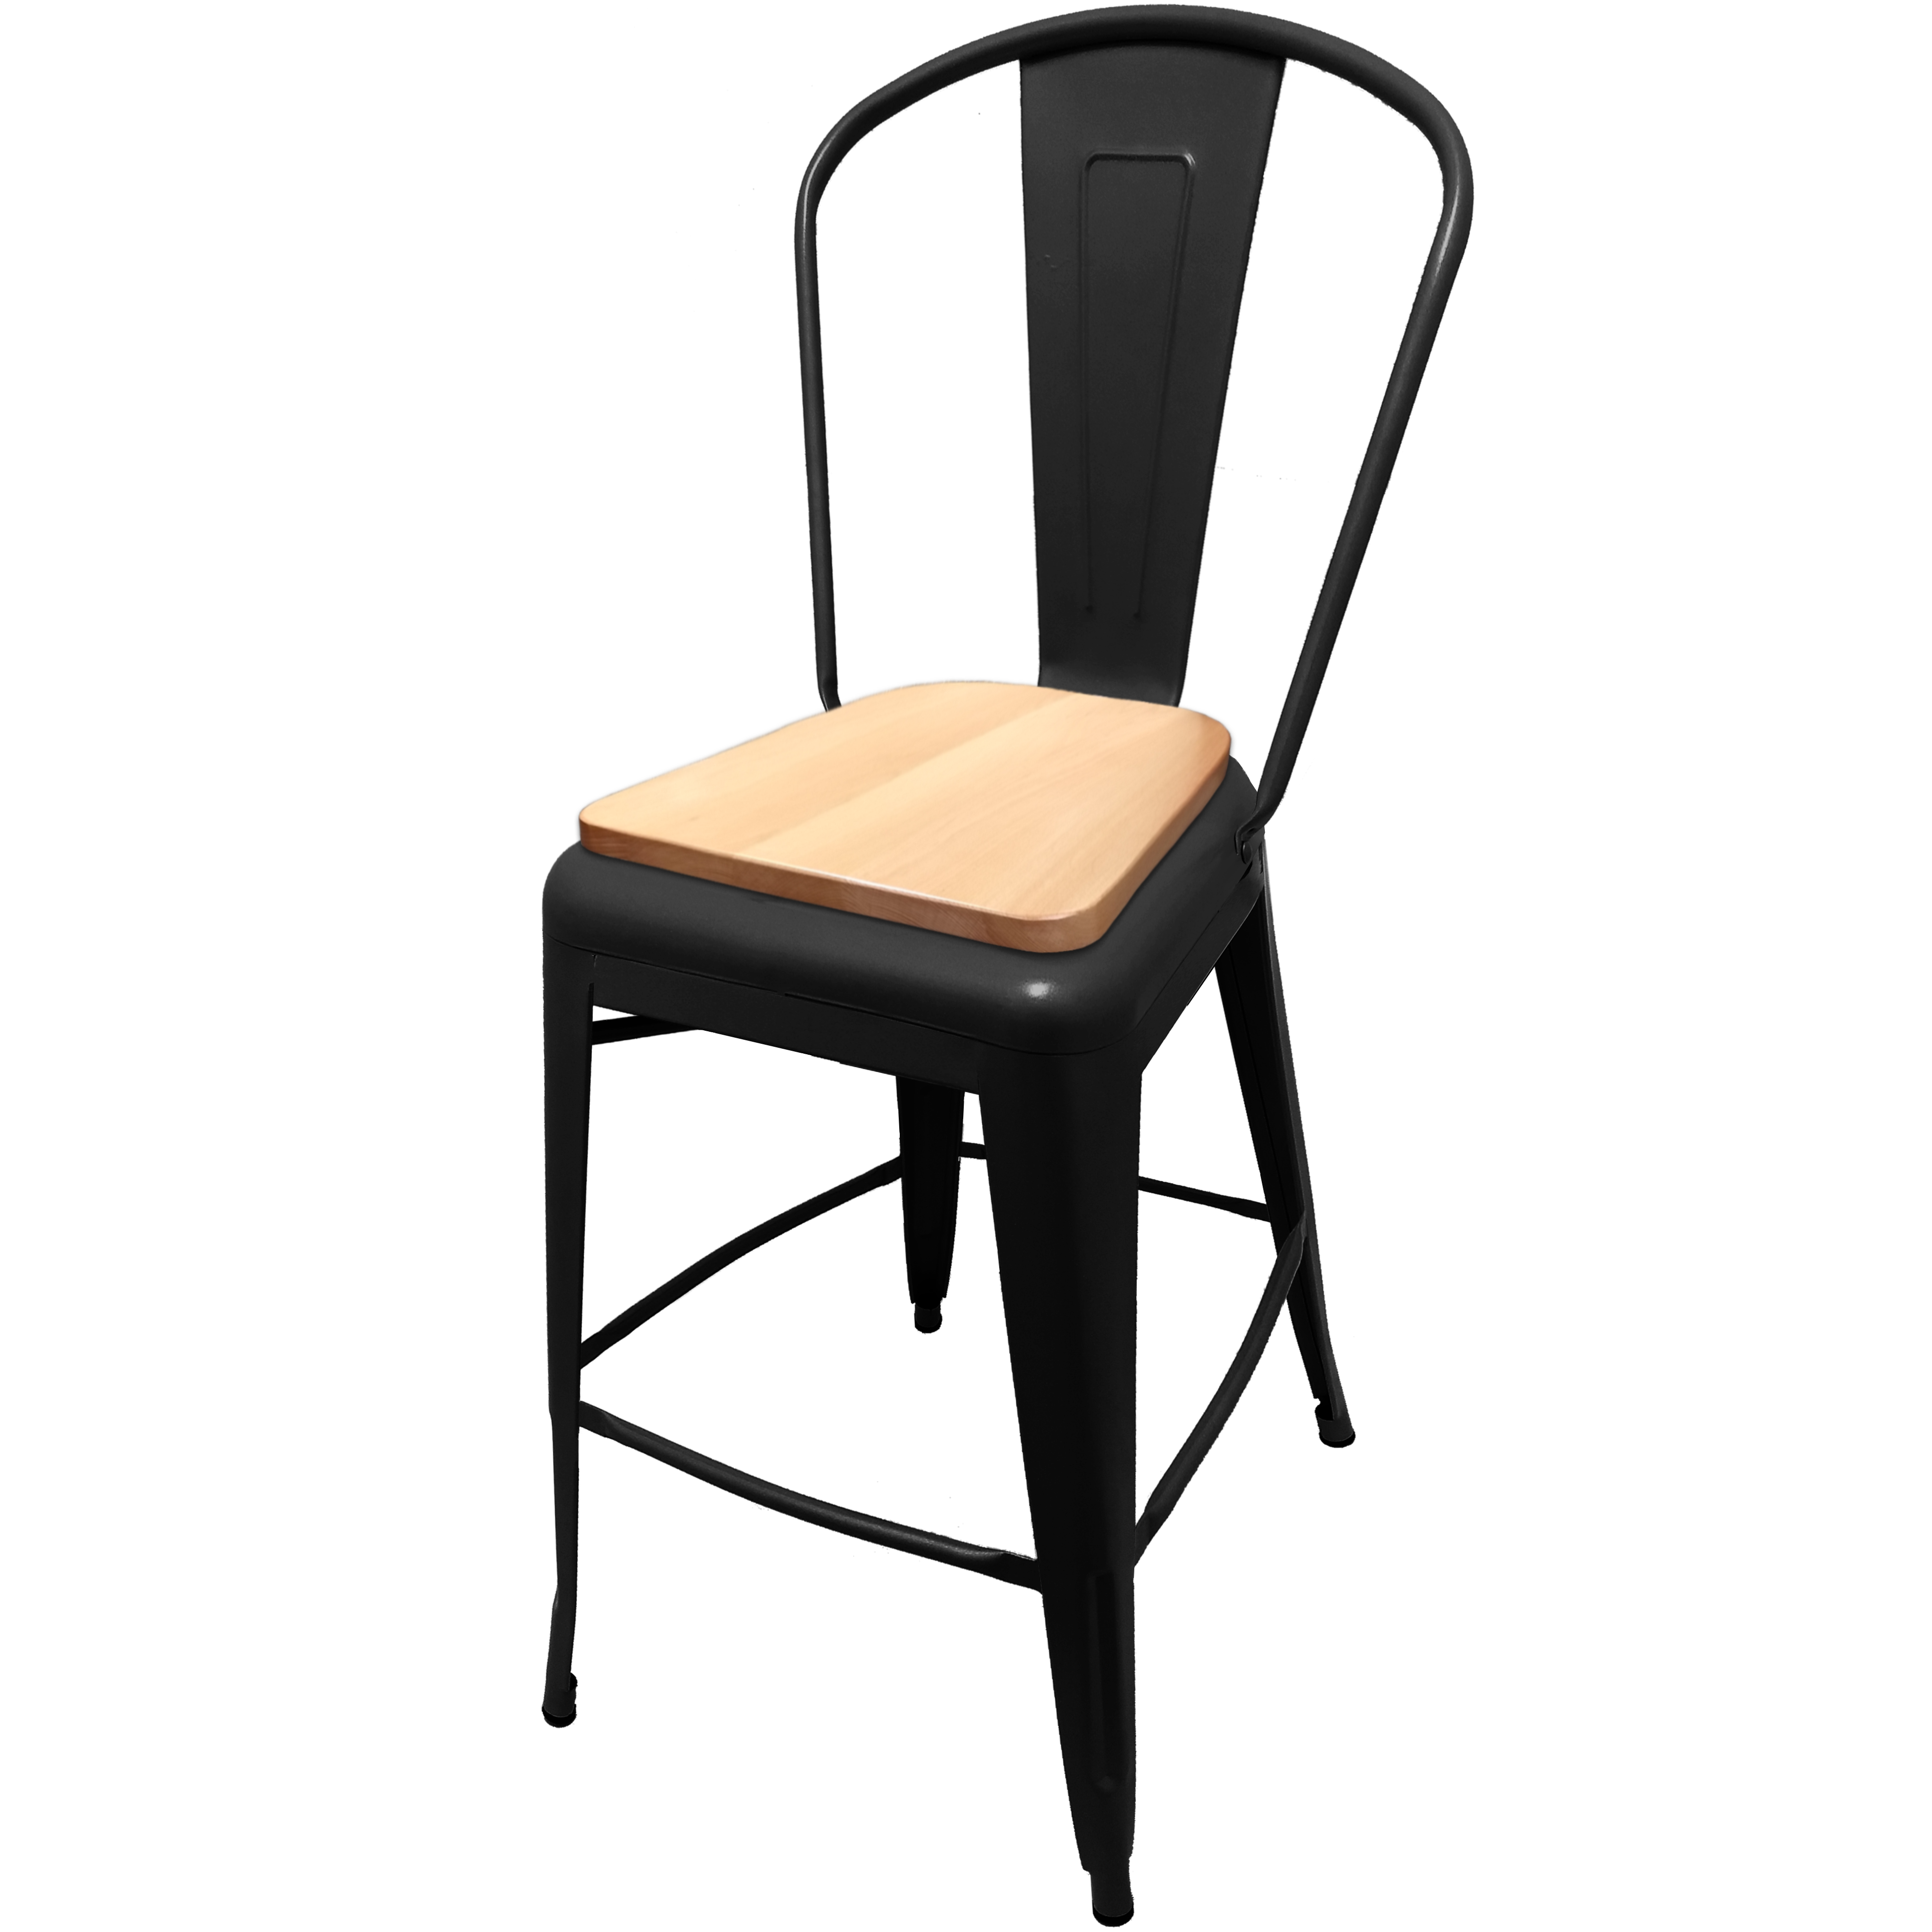 Oak Street OD-BM-0001-BLK-N bar stool, outdoor